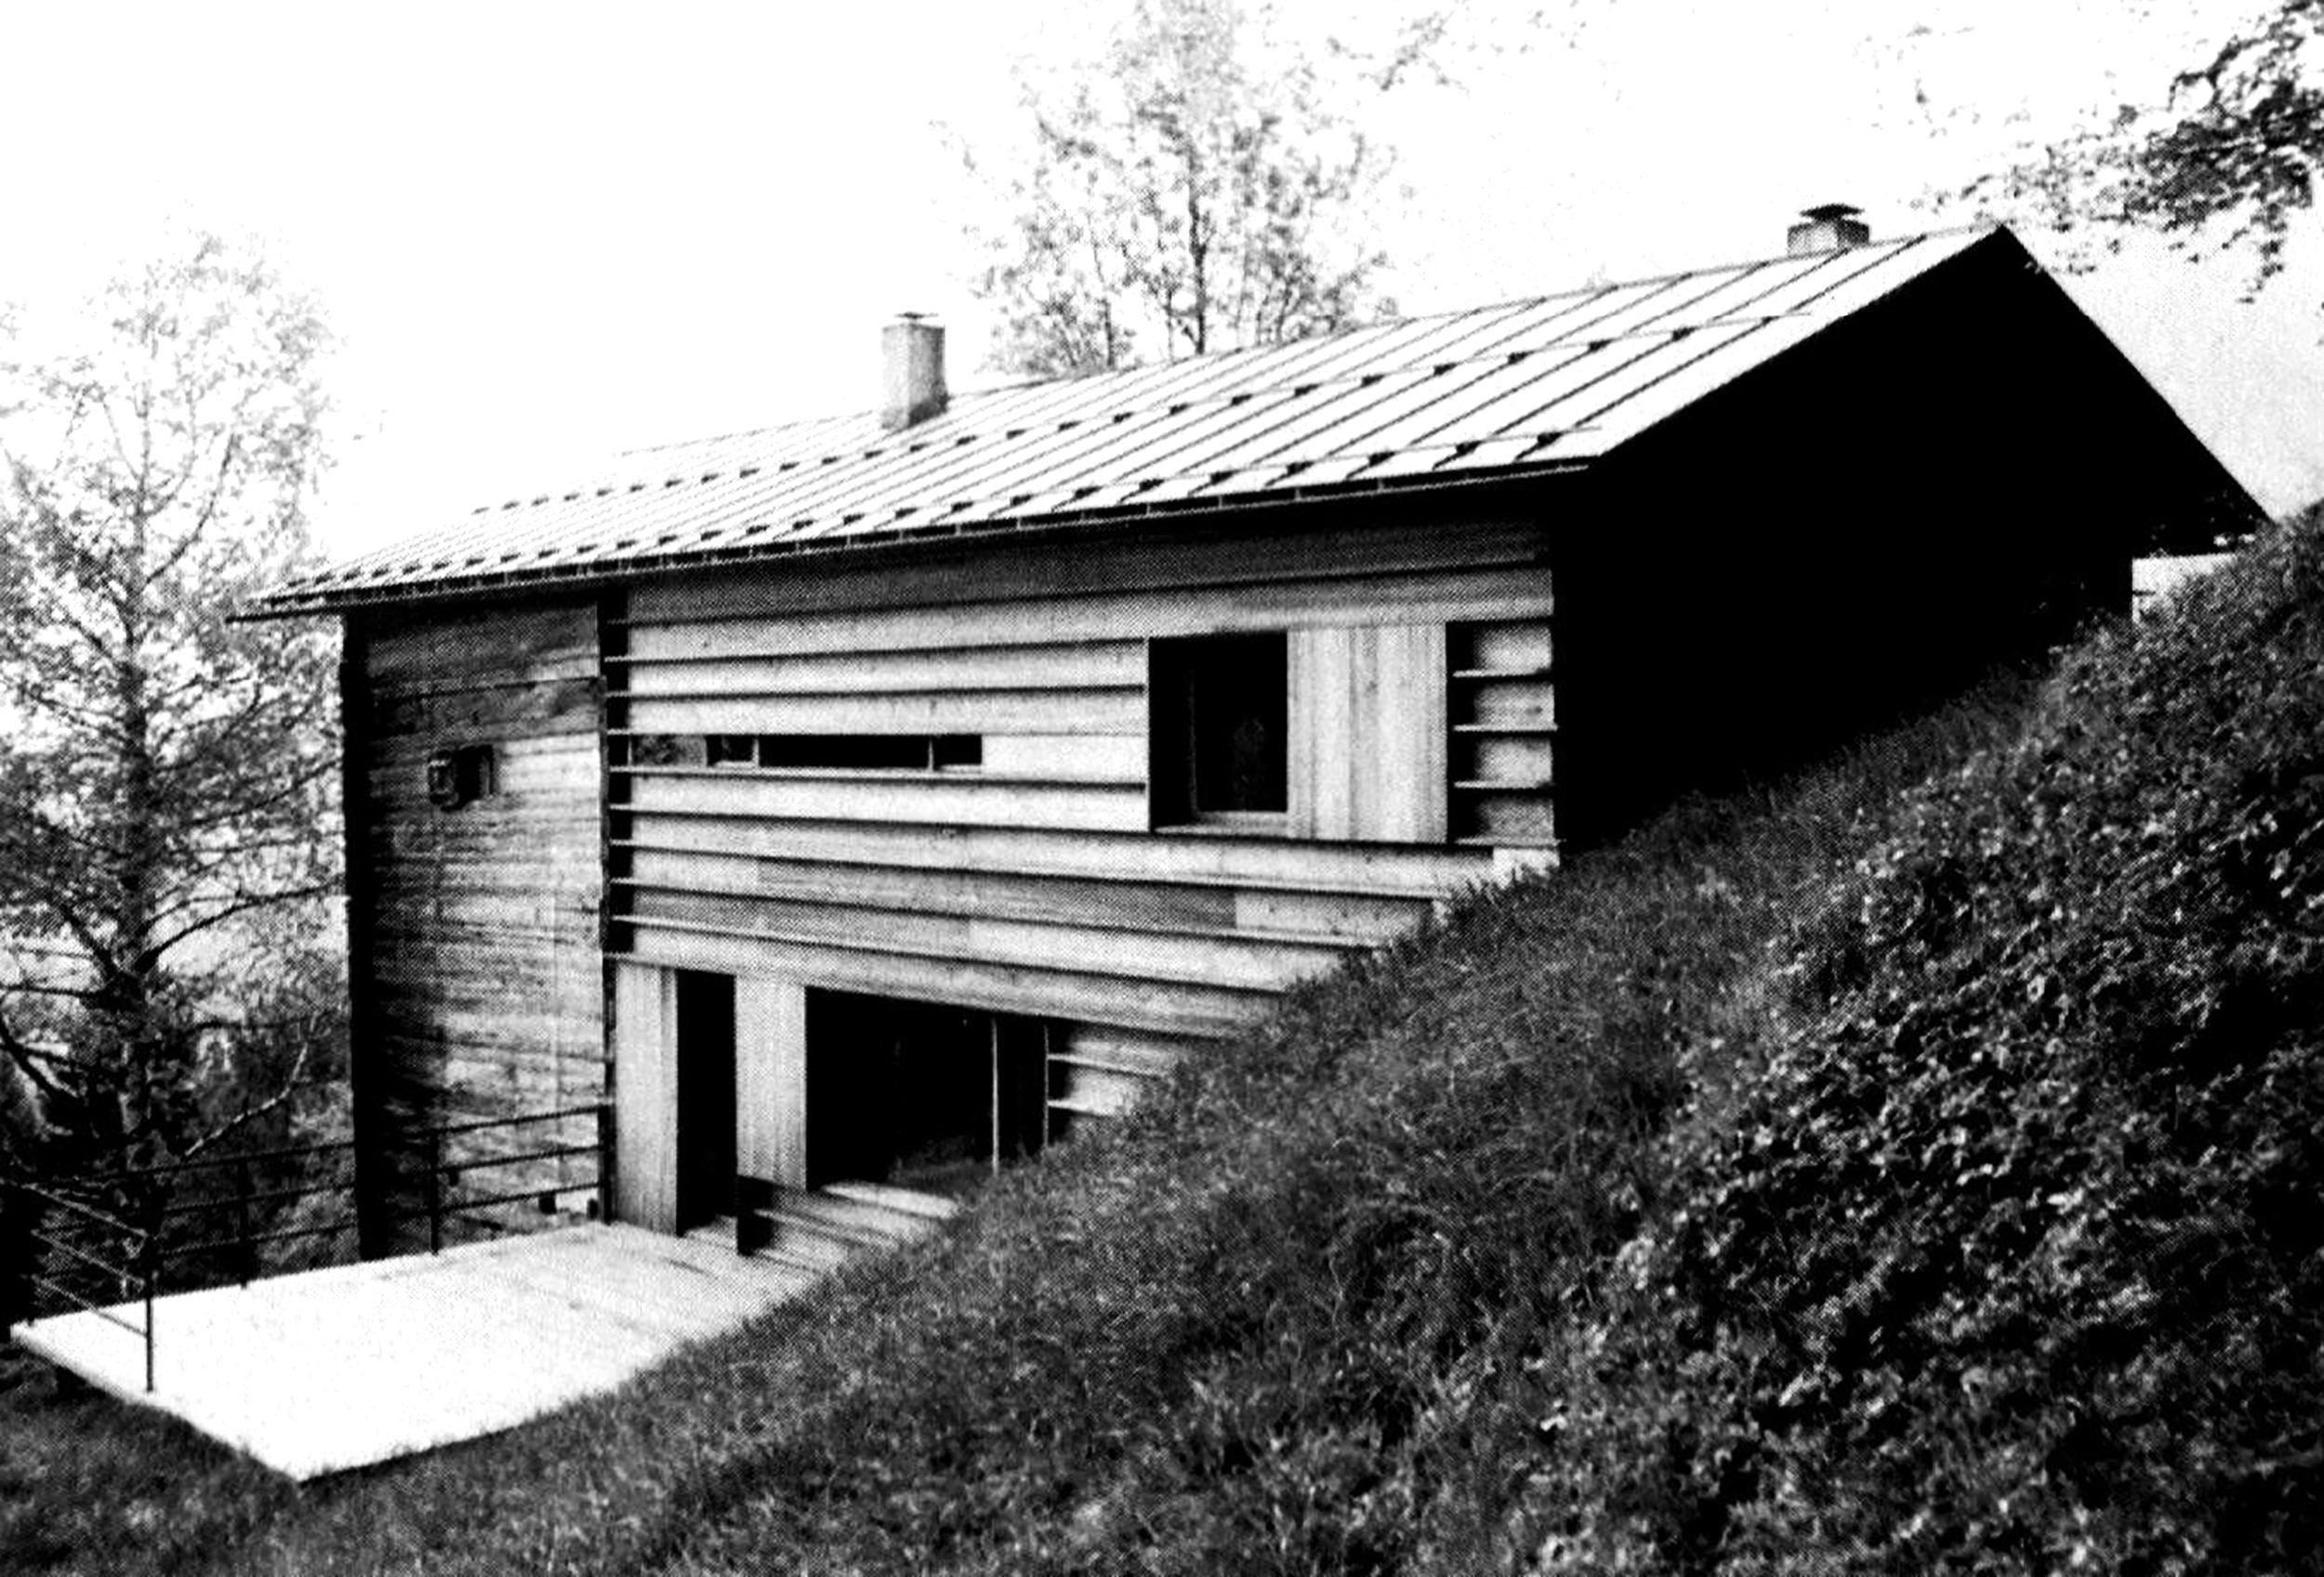 Gugalun House